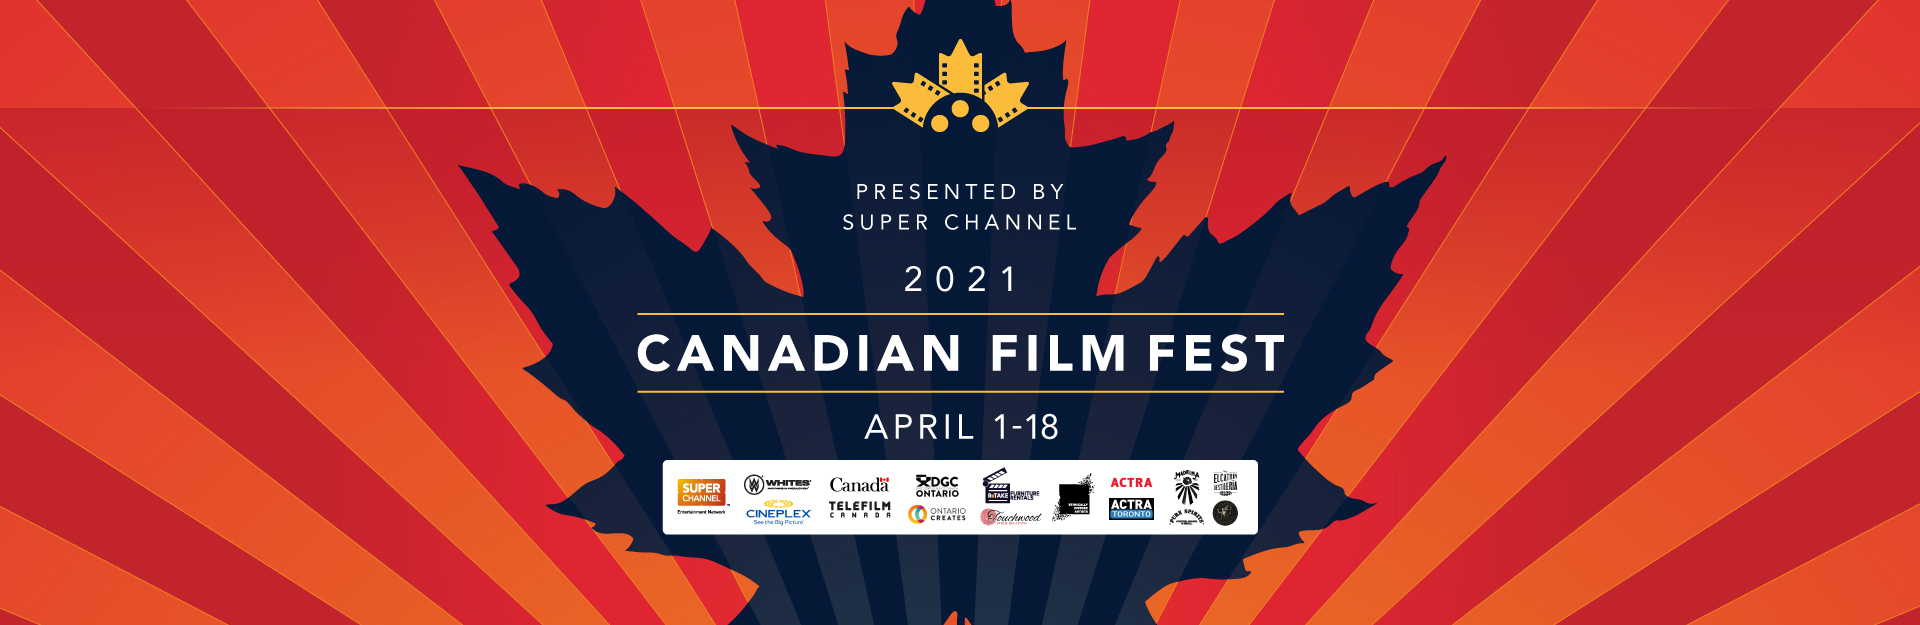 canadian film fest 2021